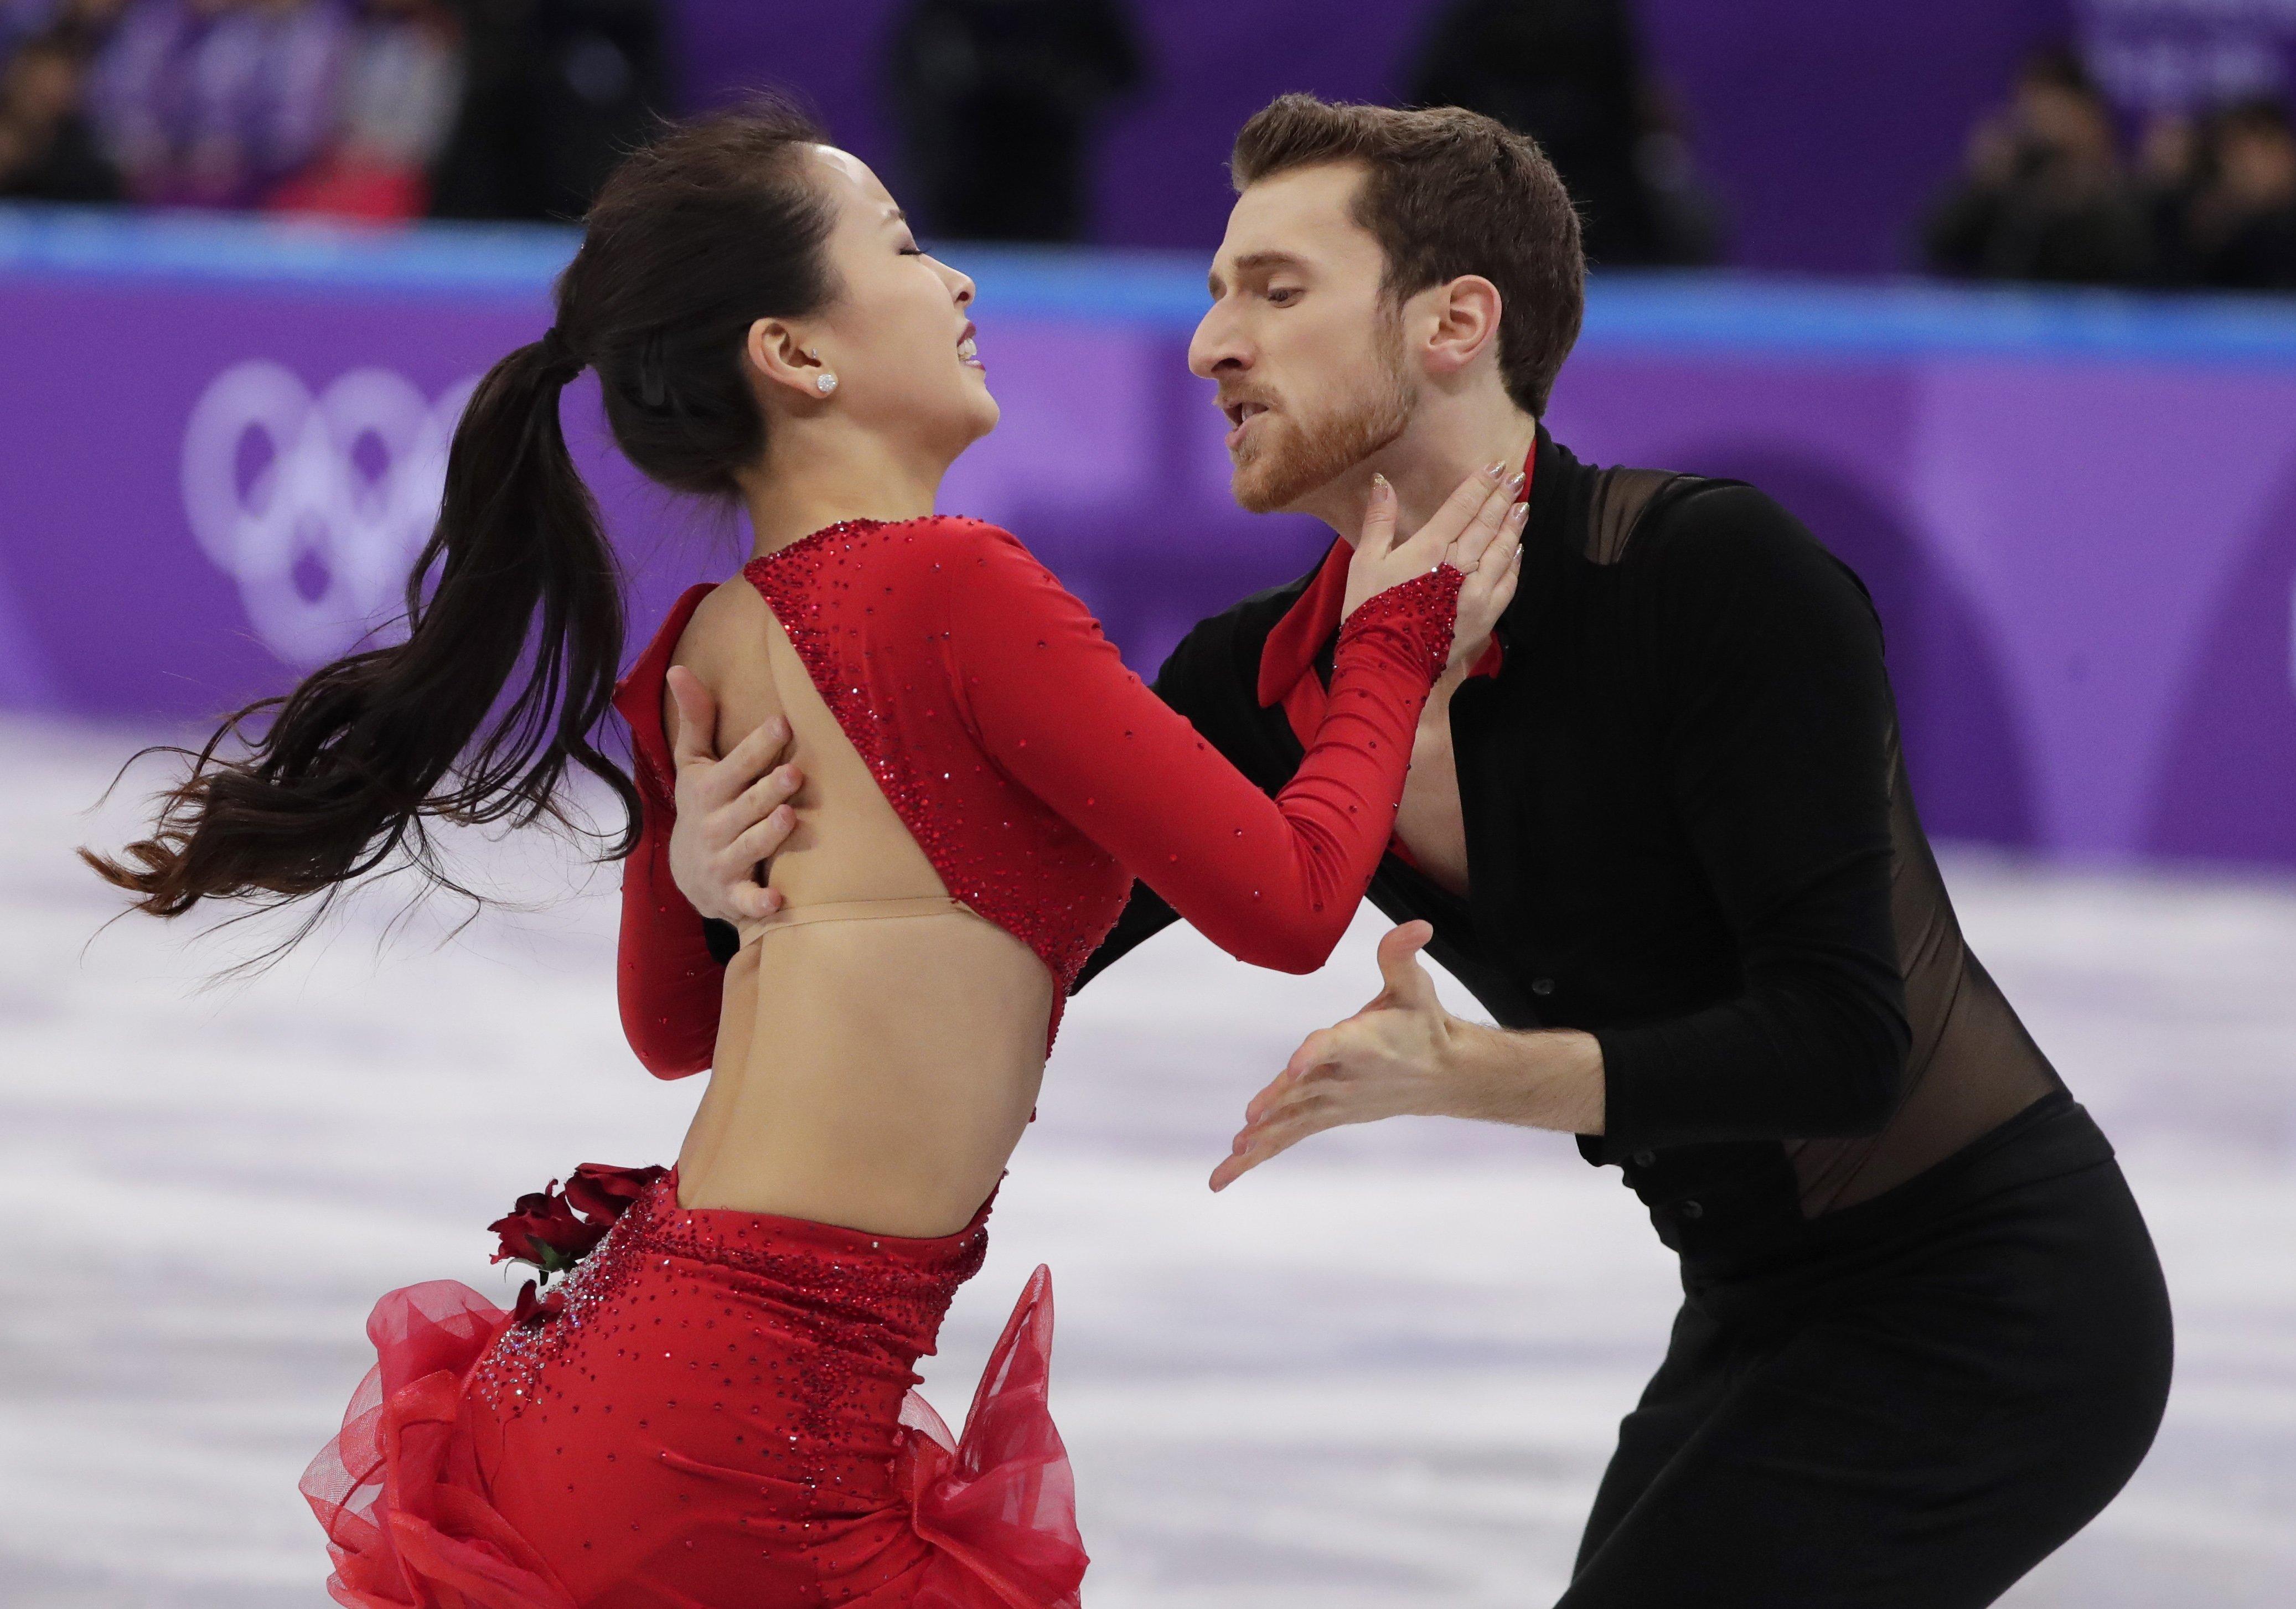 Winter Olympics Wardrobe Malfunction In Figure Skating